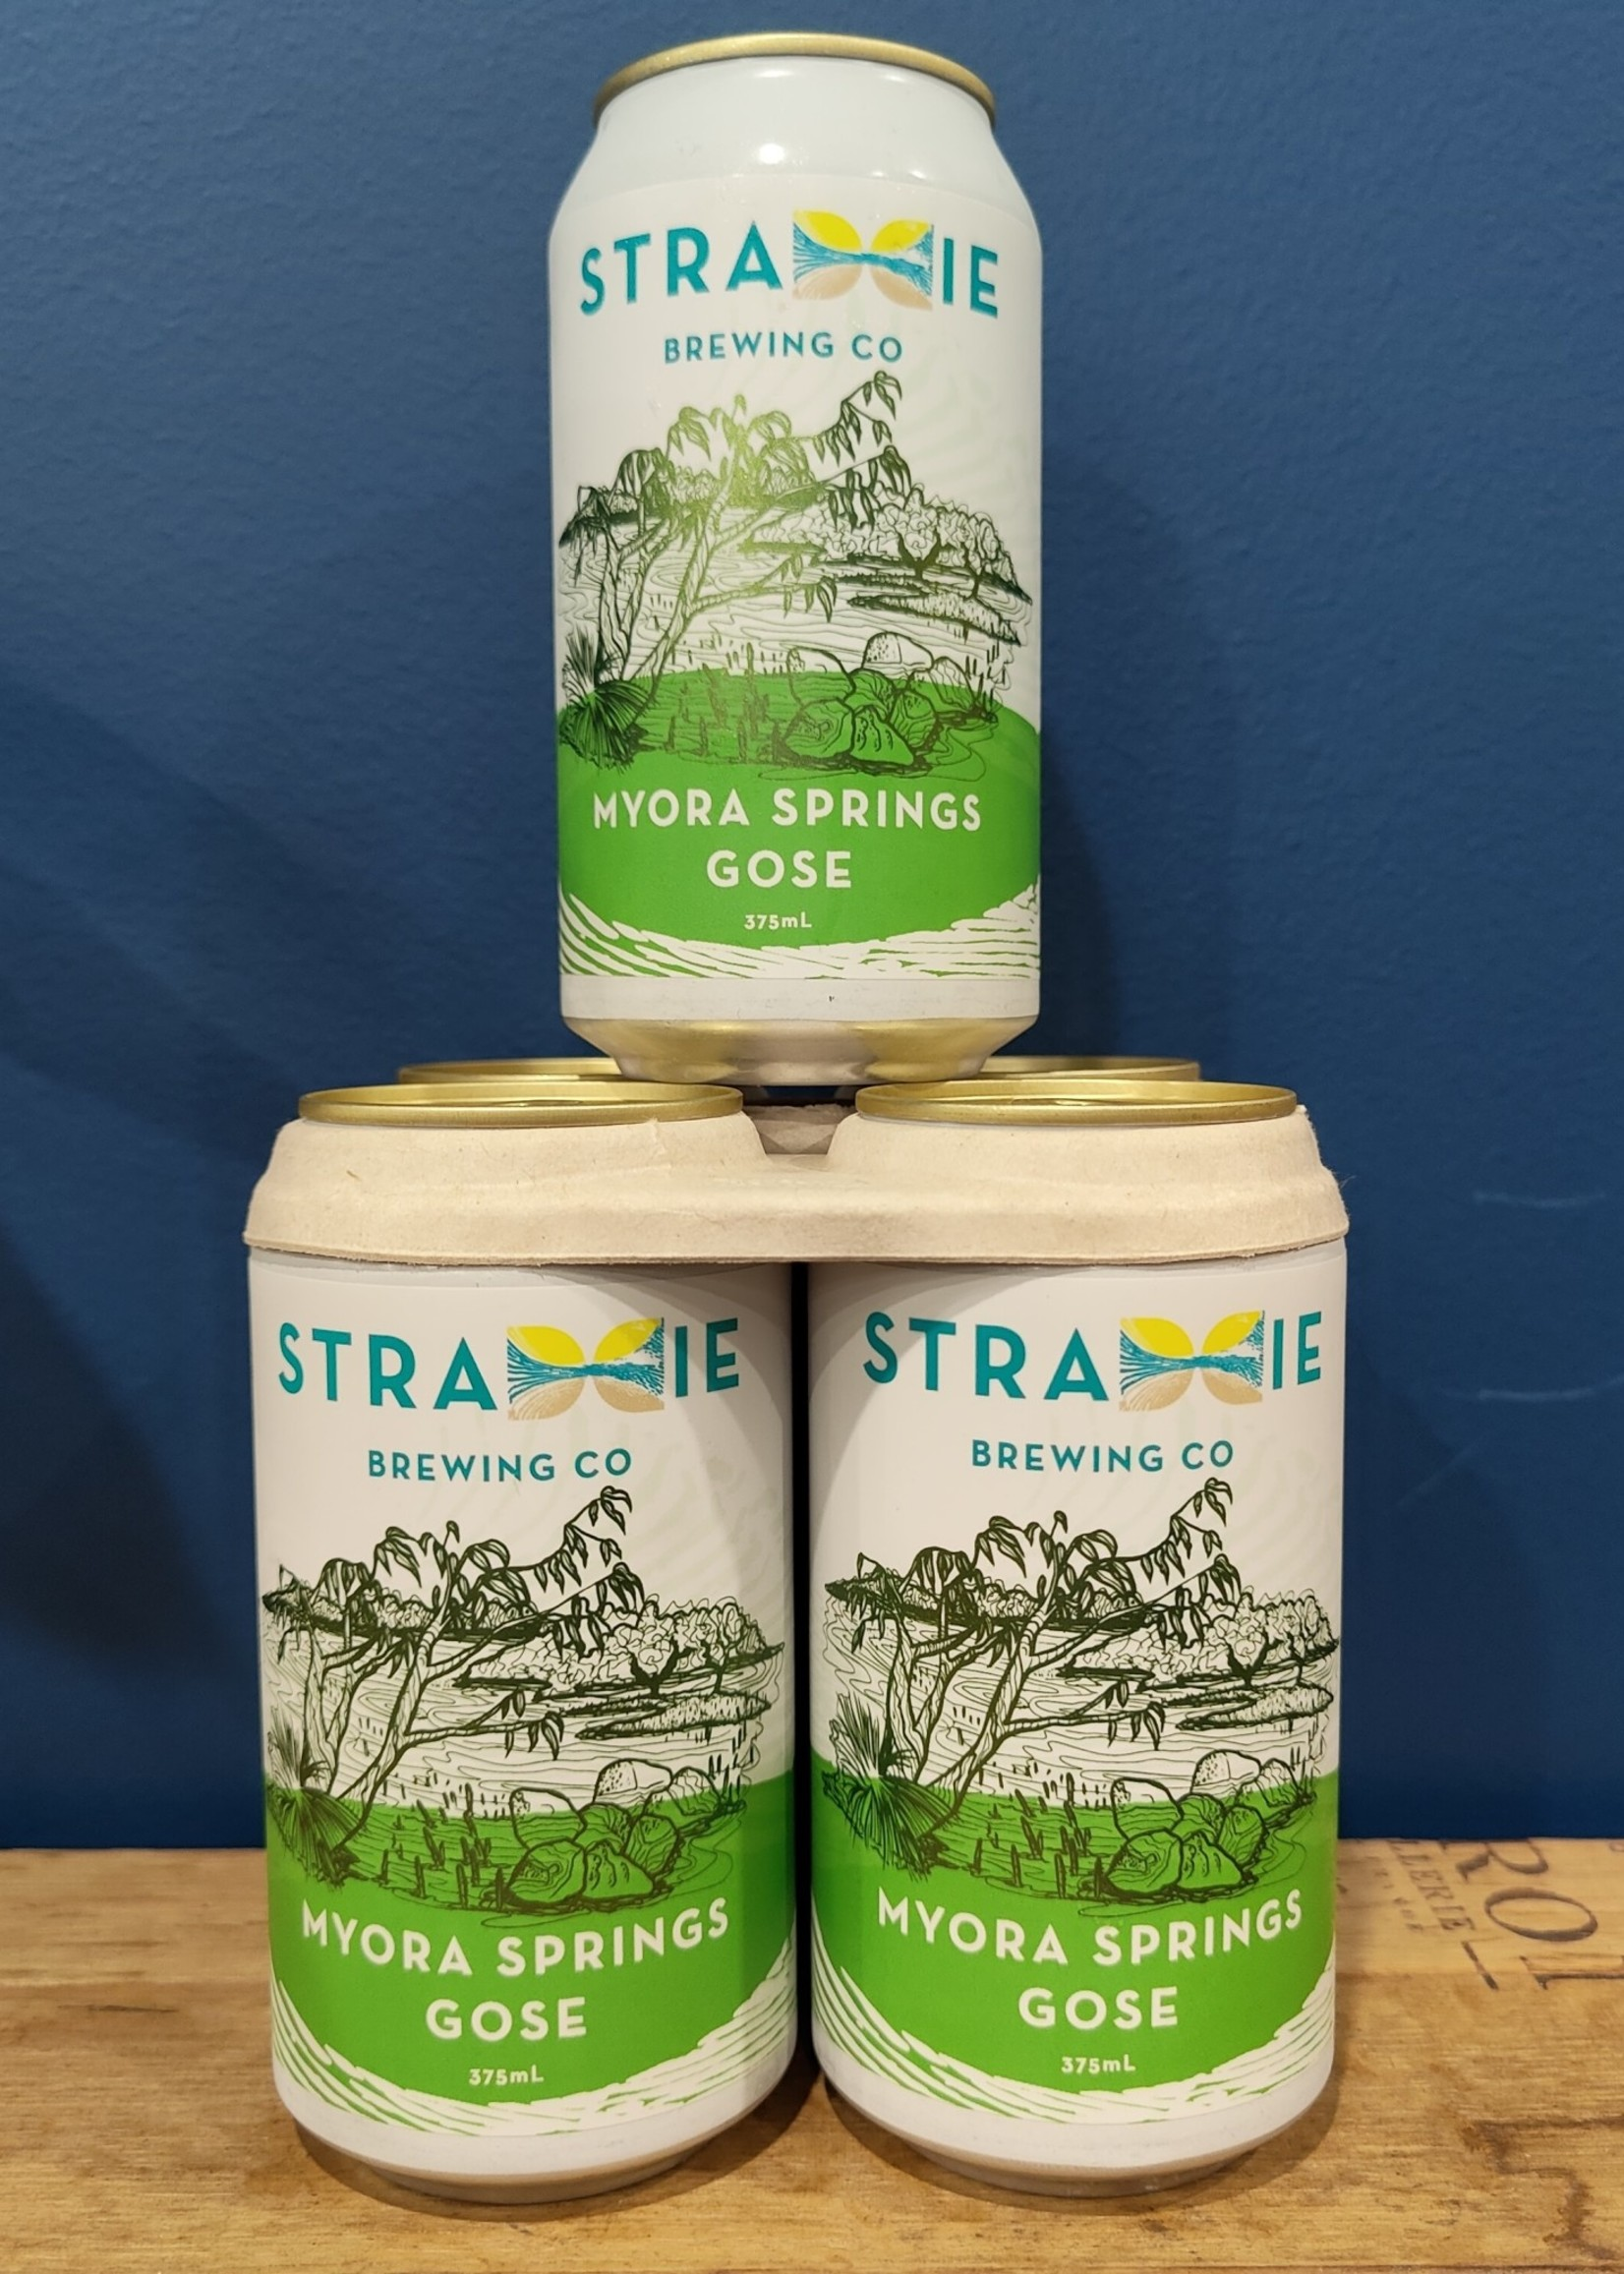 Stradbroke Brewing Co. Myora Springs Gose